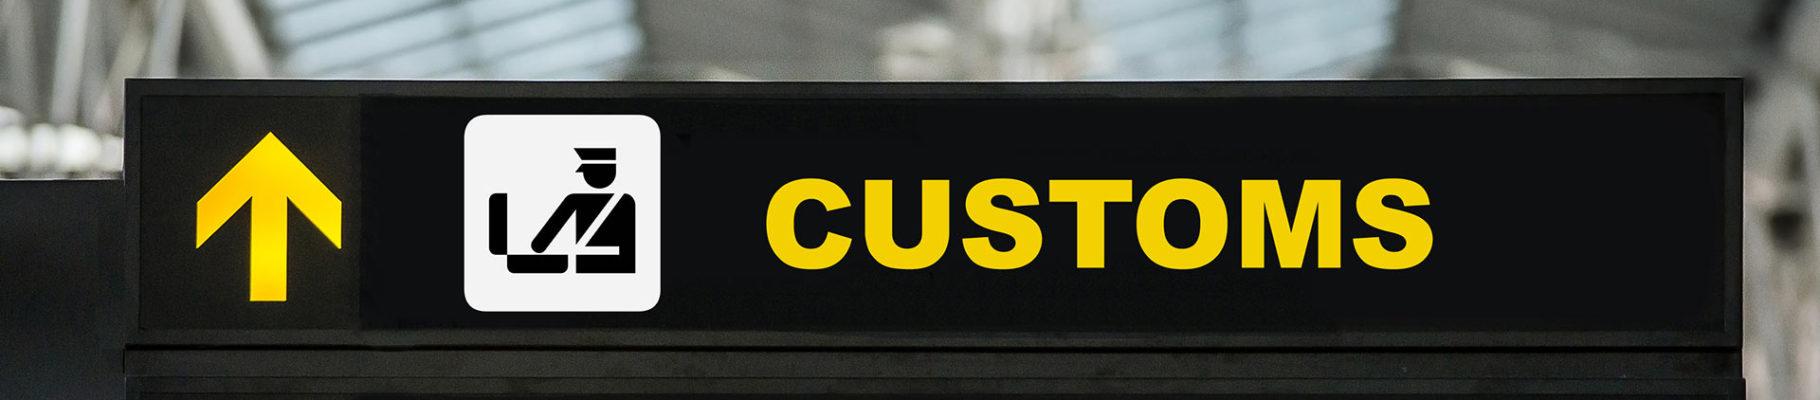 cyberfreight customs VAT douane